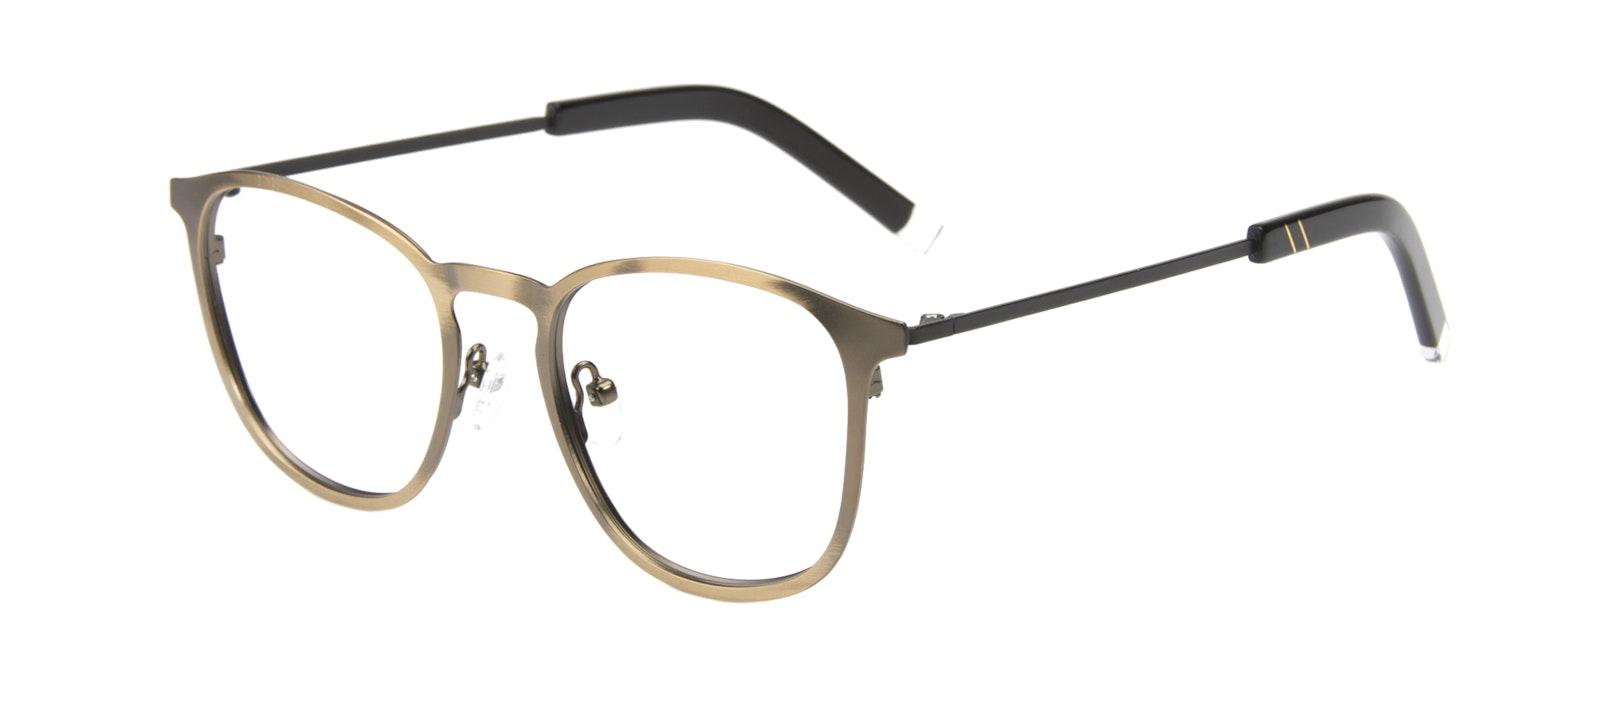 Affordable Fashion Glasses Rectangle Square Eyeglasses Men Core Mud Tilt